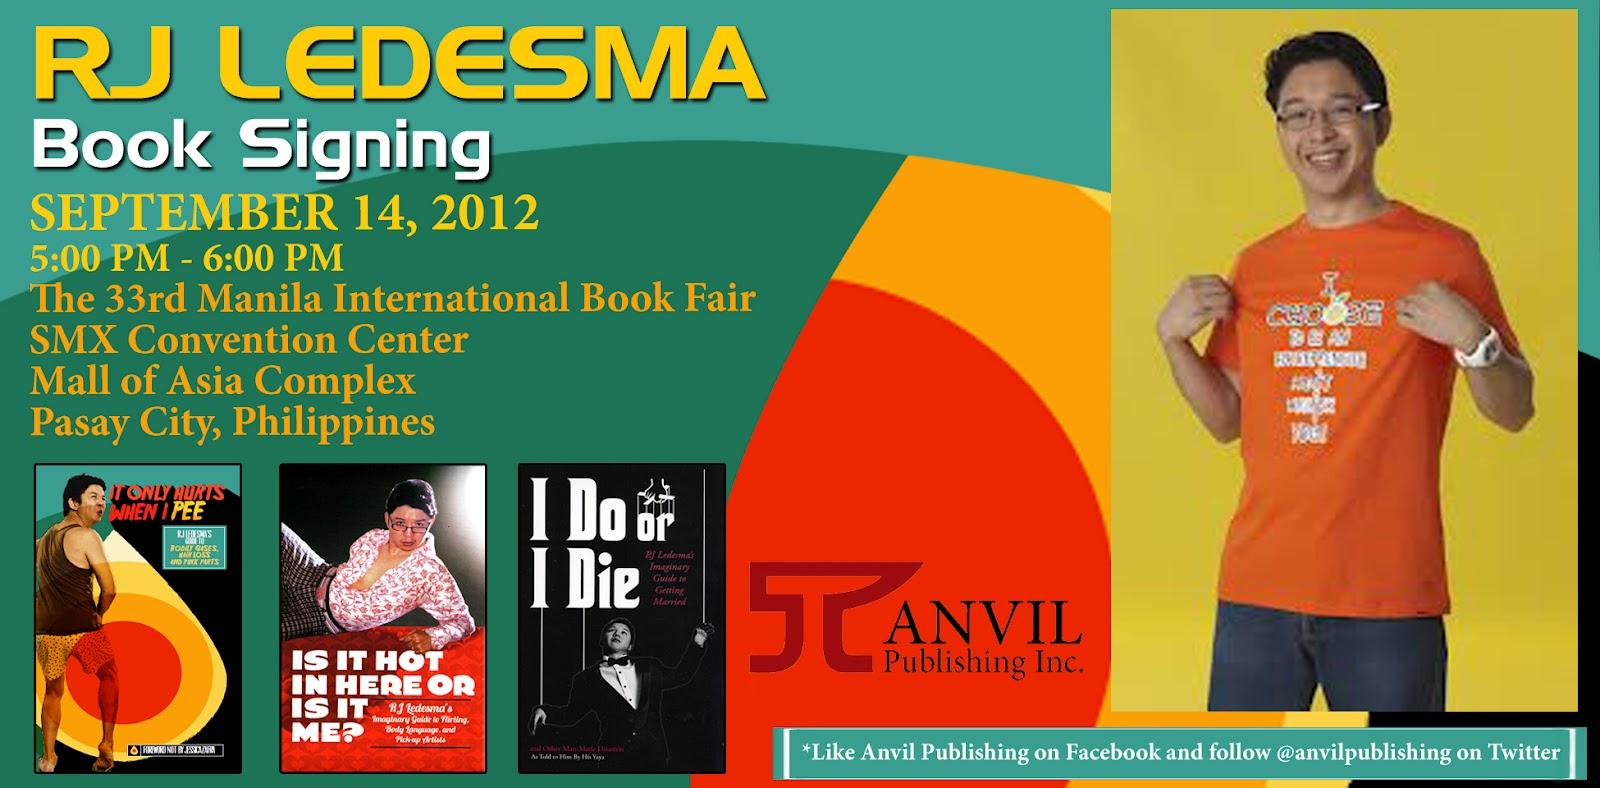 RJ Ledesma book signing at the 33rd Manila International